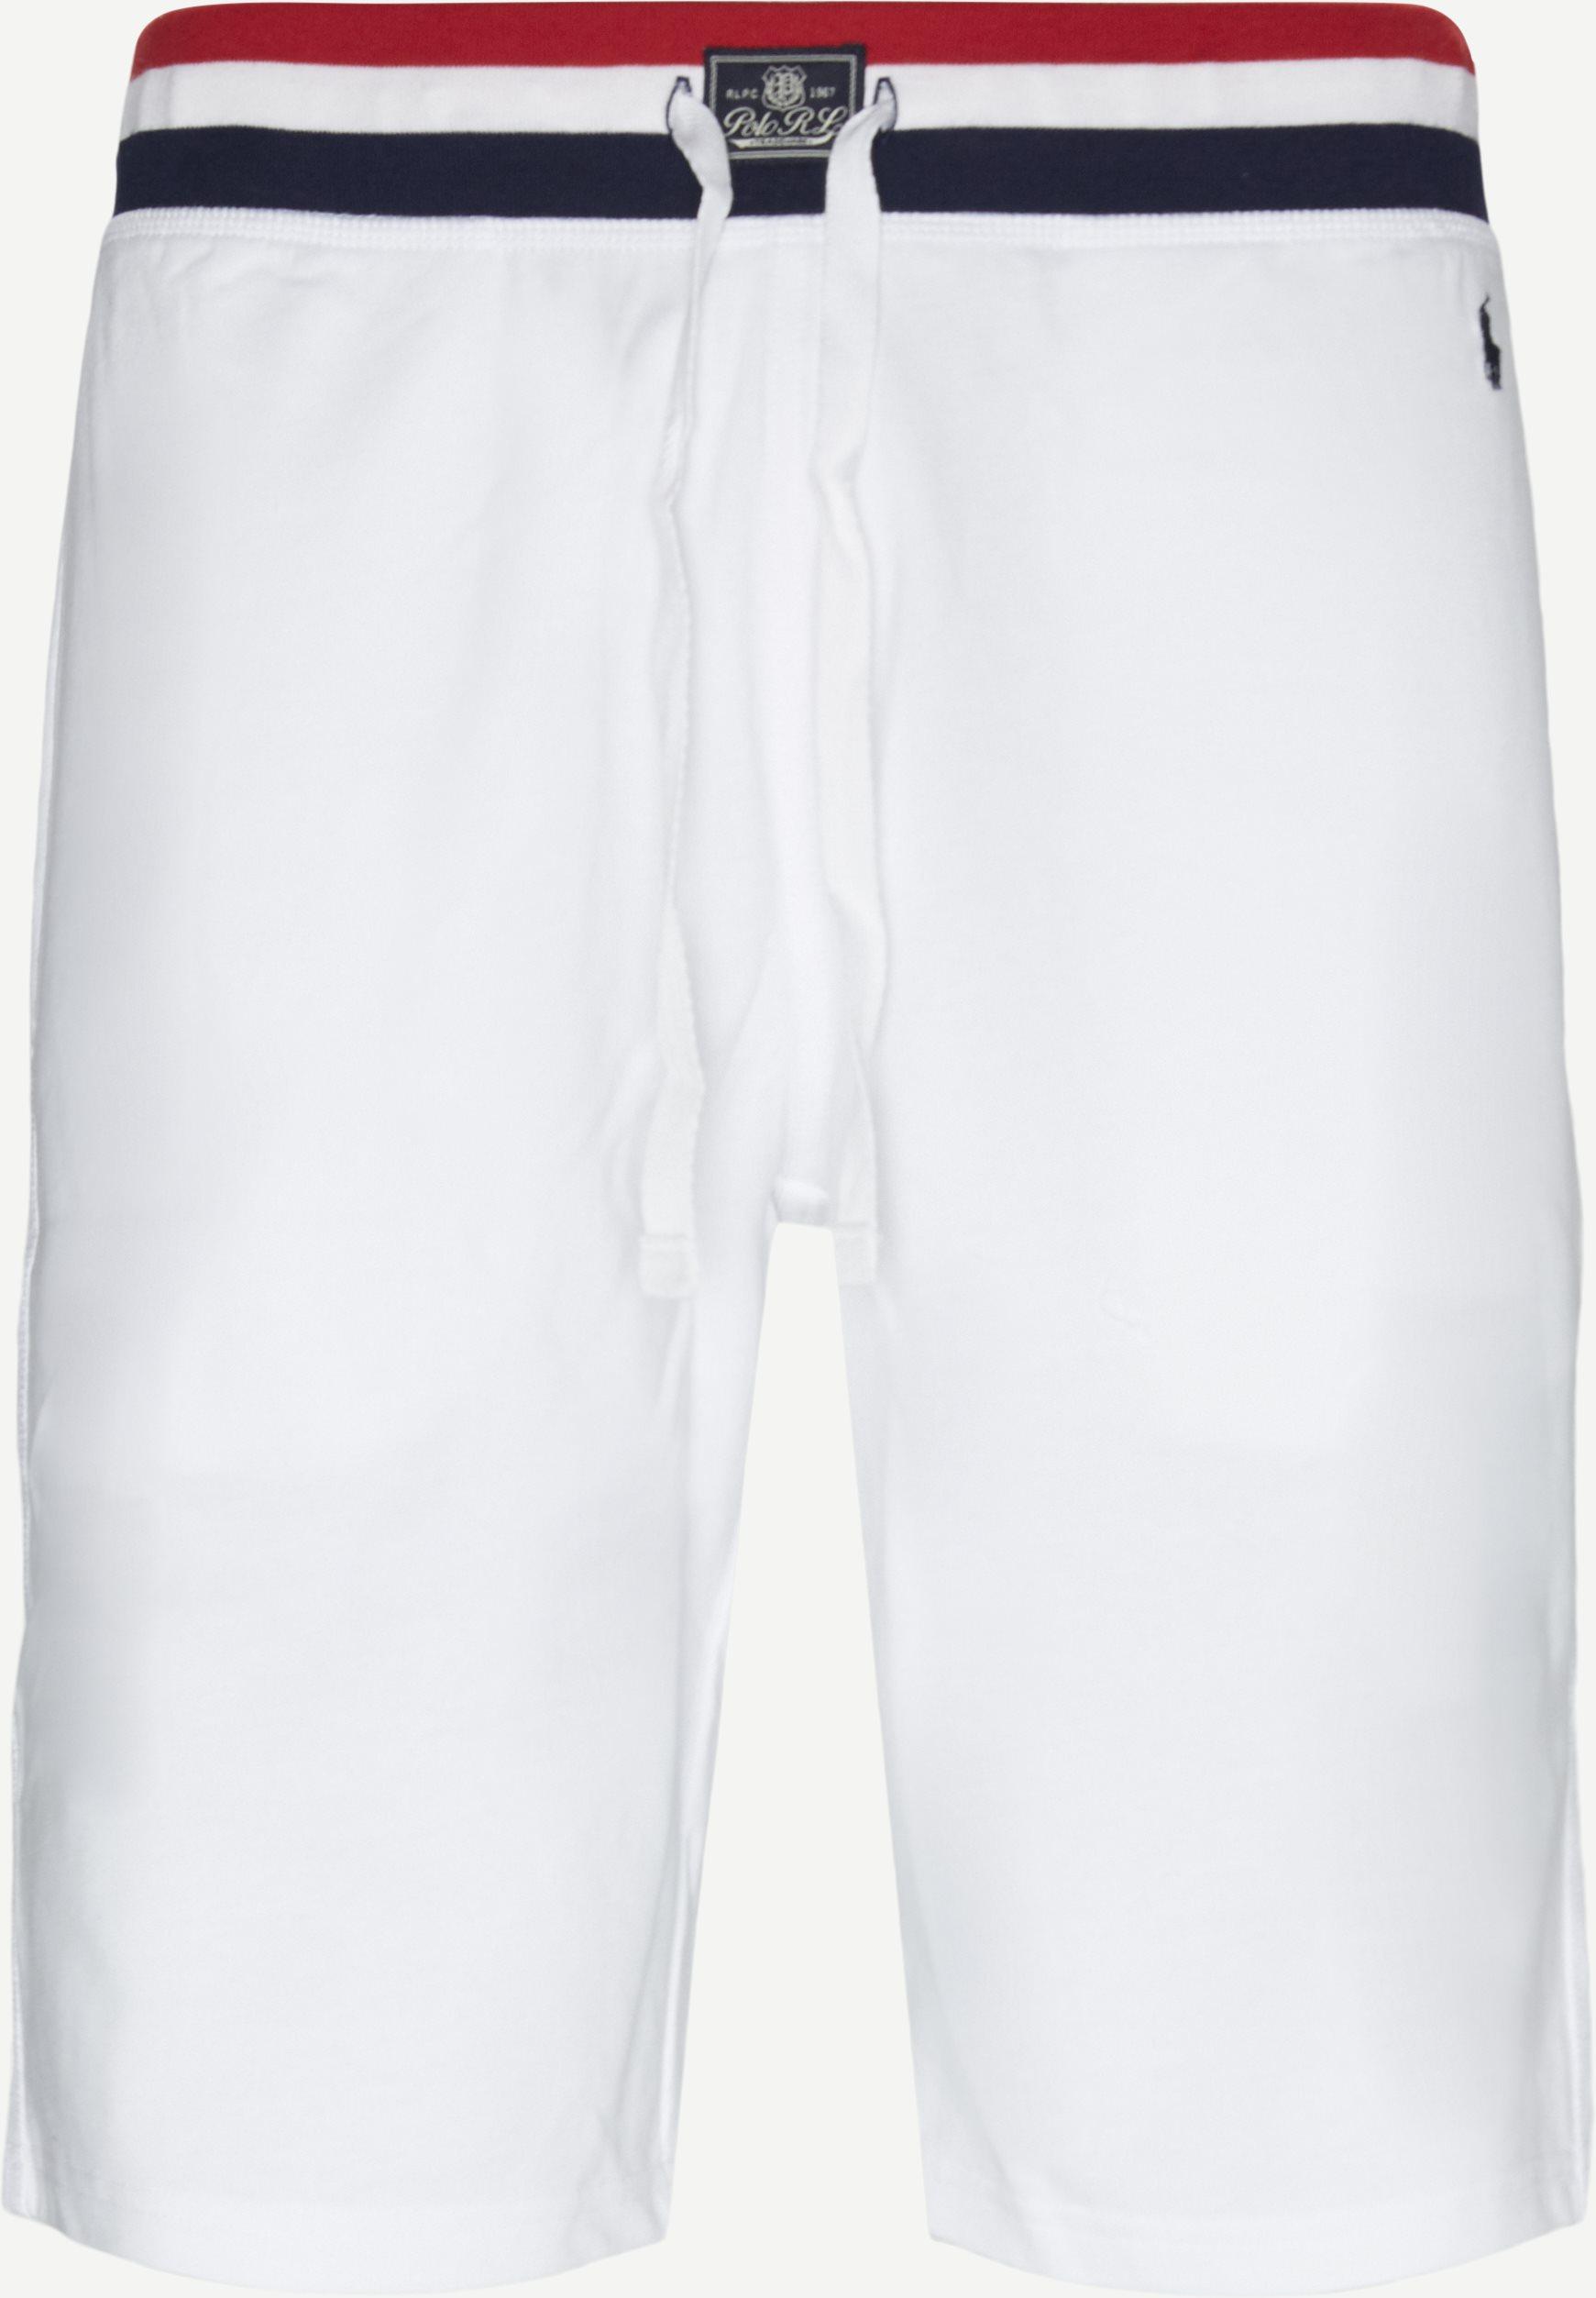 Shorts - Regular - White